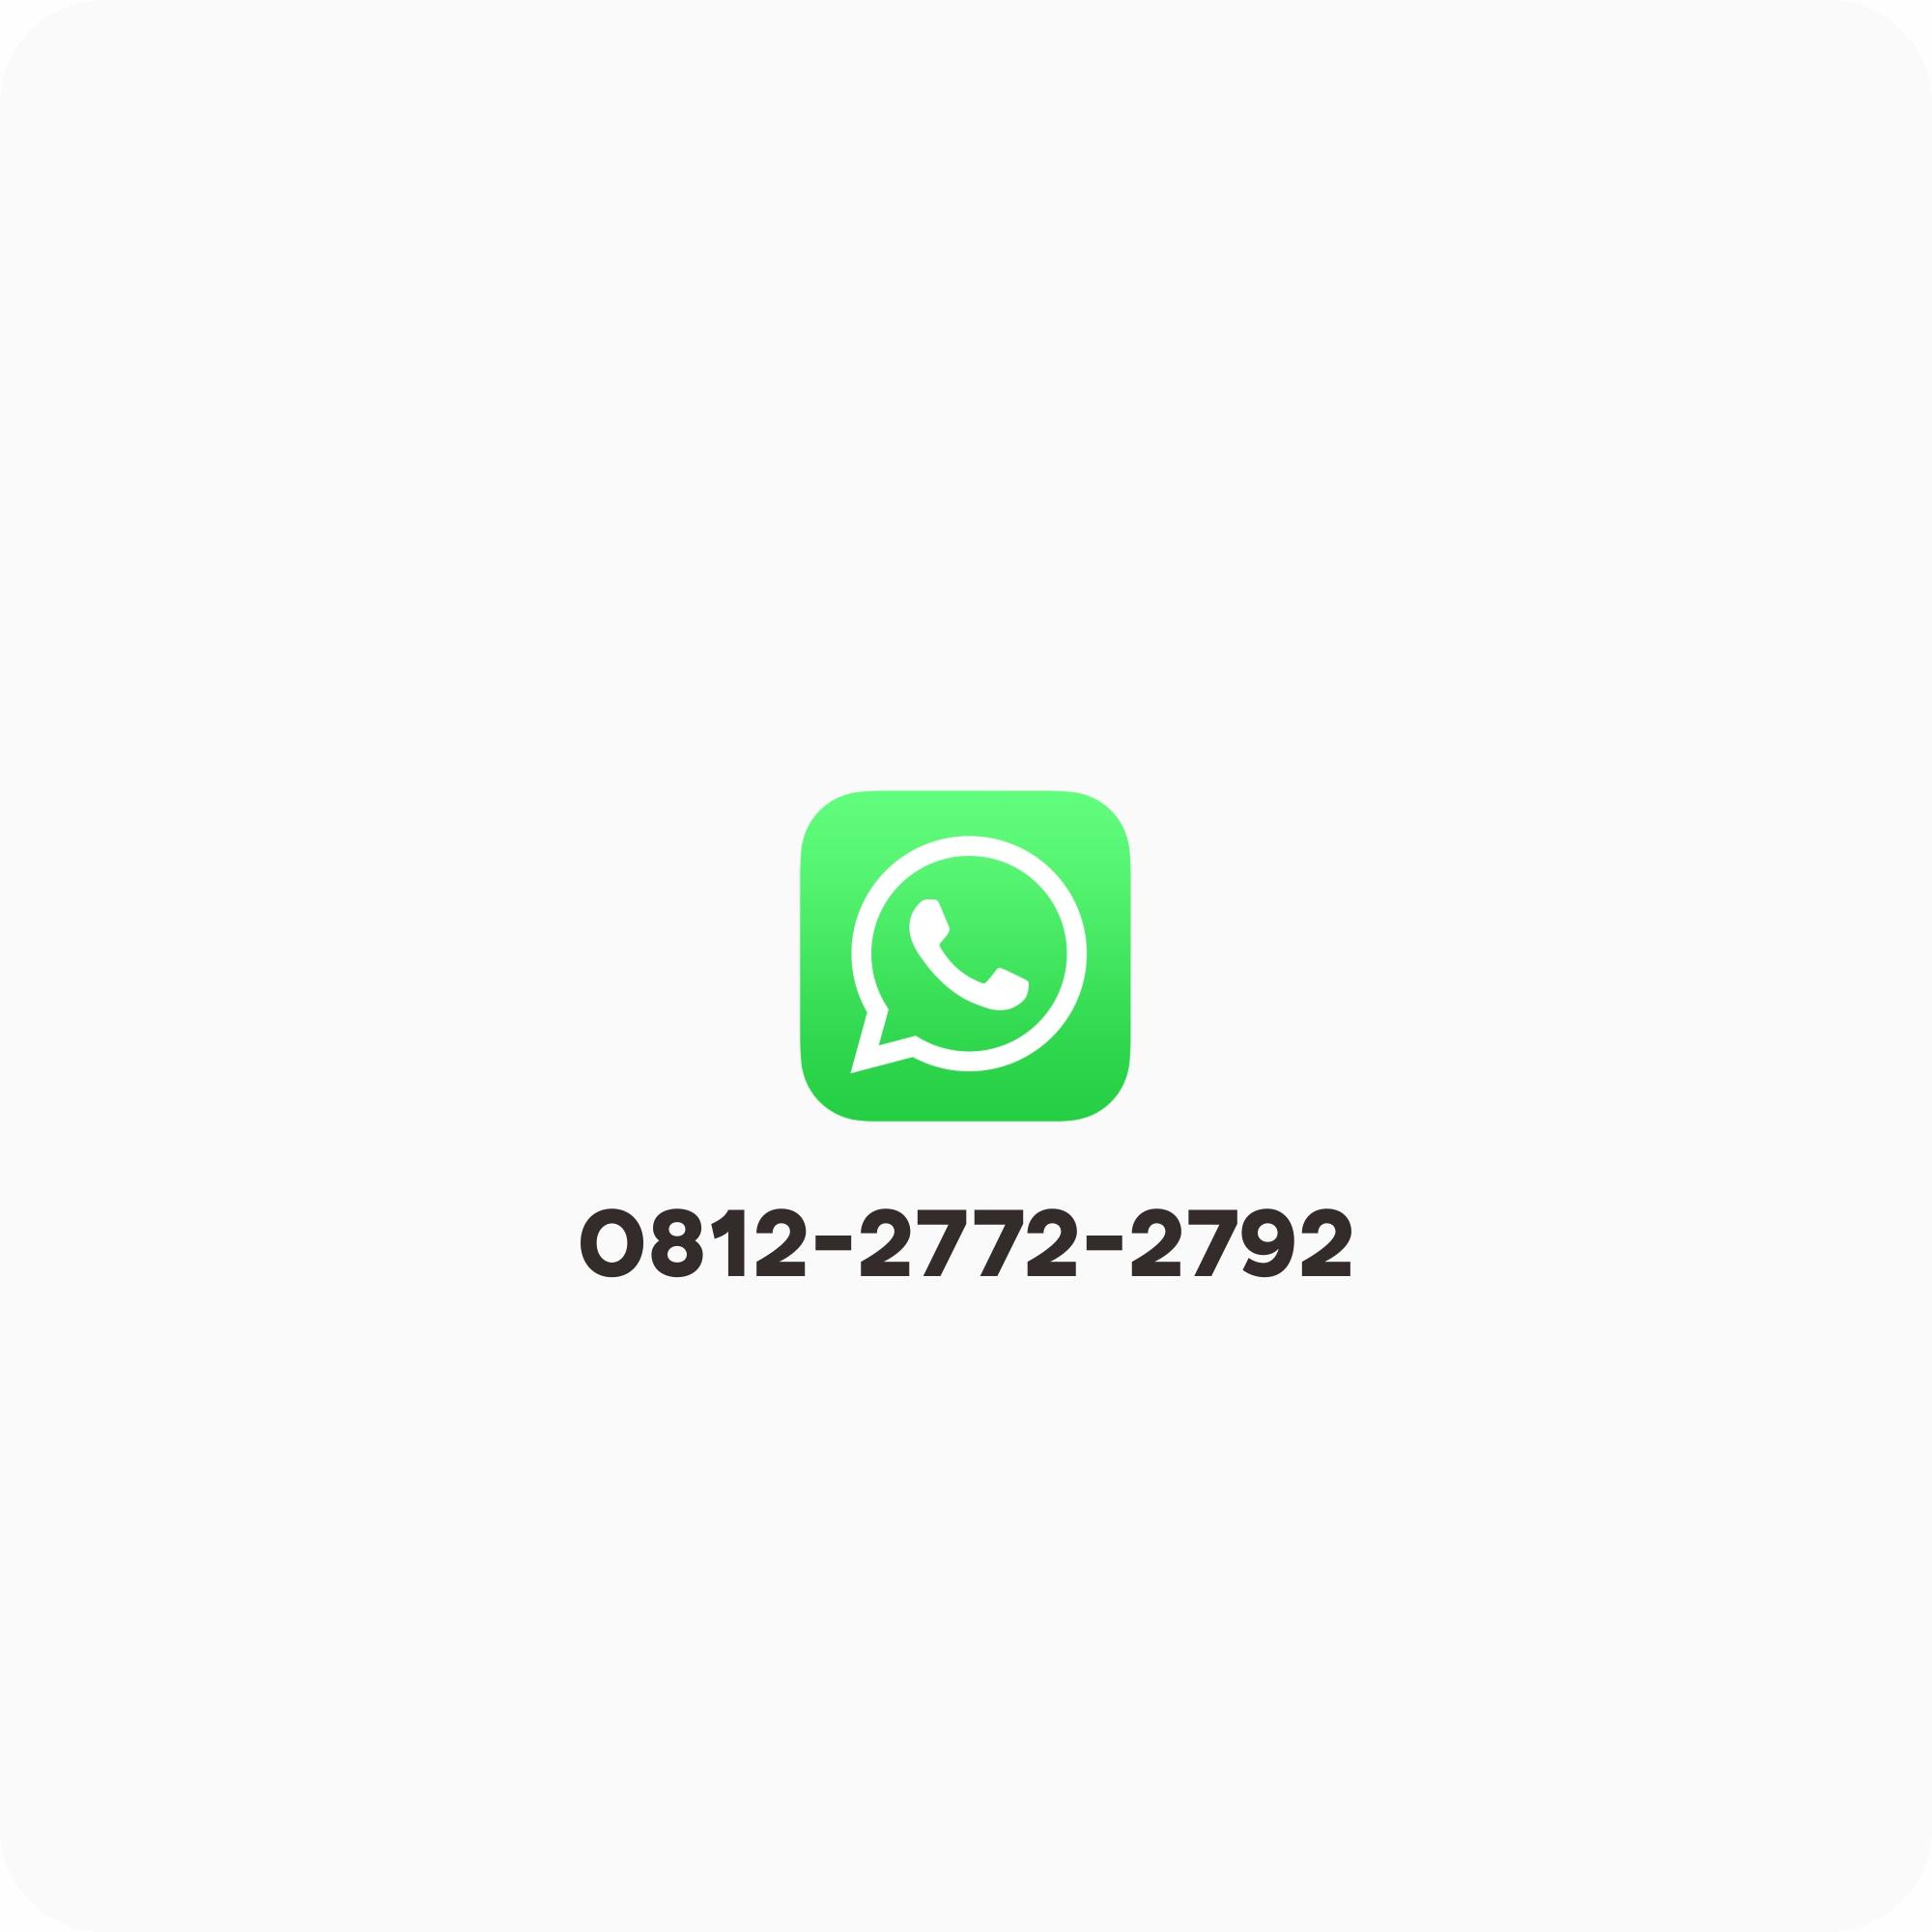 whatsapp stiker mobil bandung